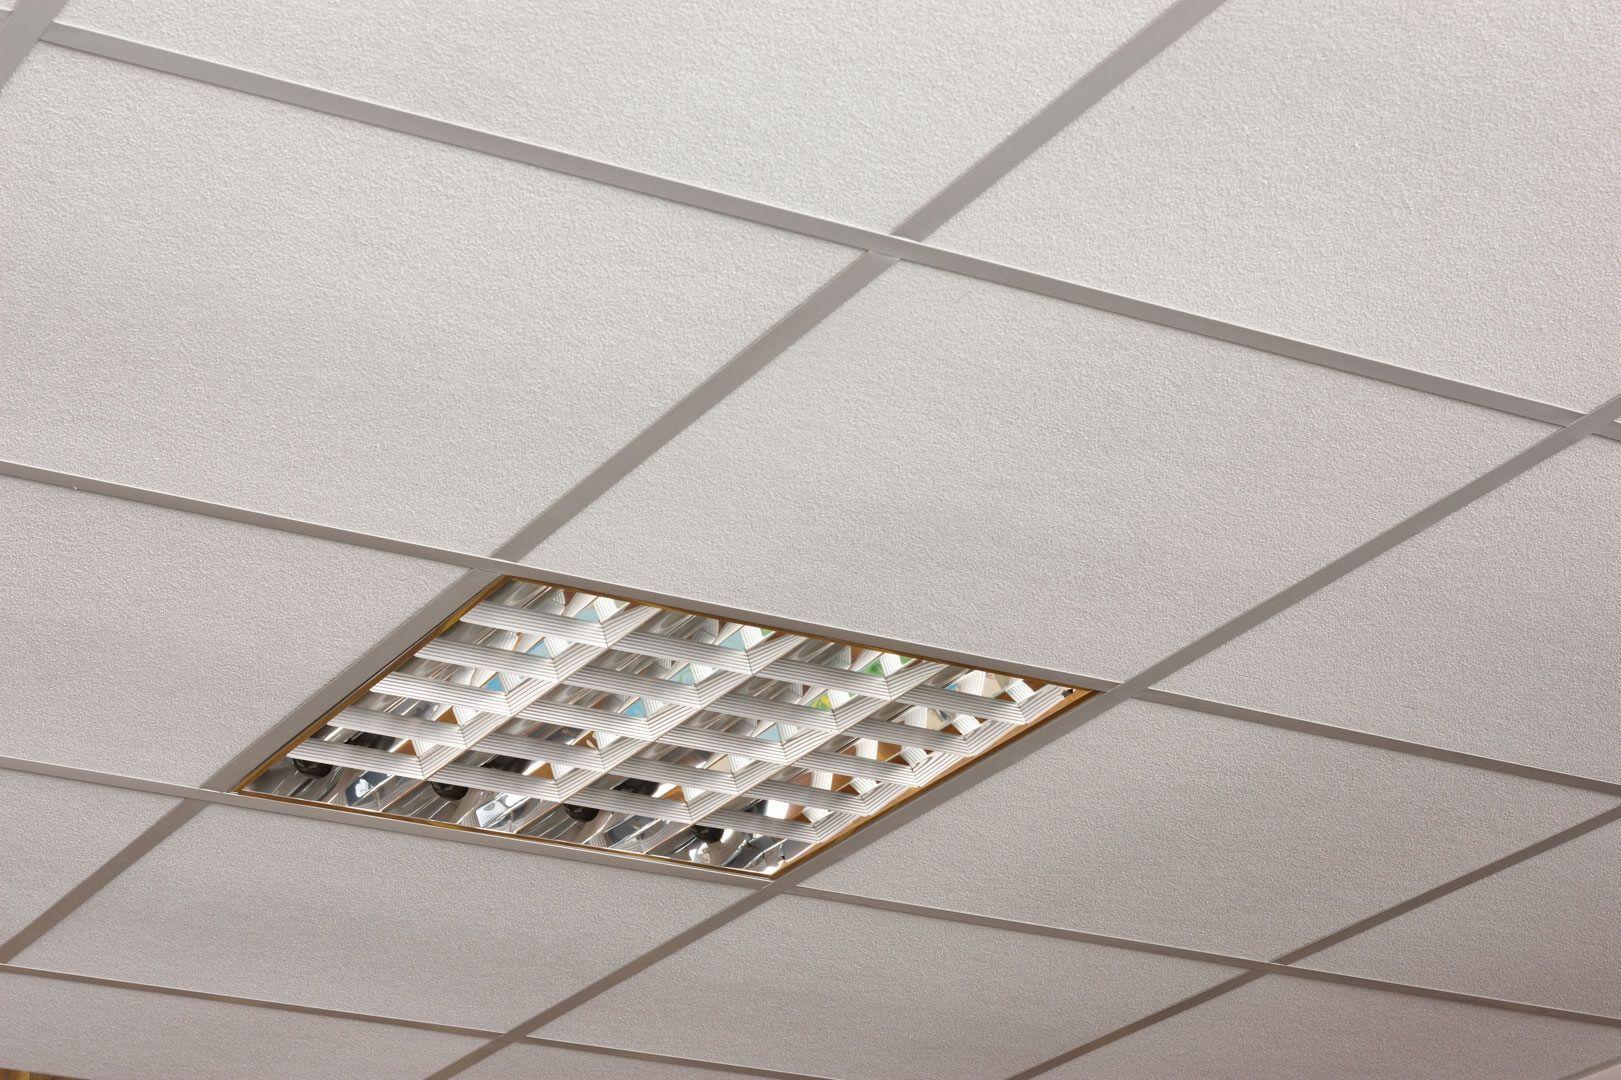 Armstrong Ceiling Tiles Drop Ceiling   Drop ceiling tiles ...